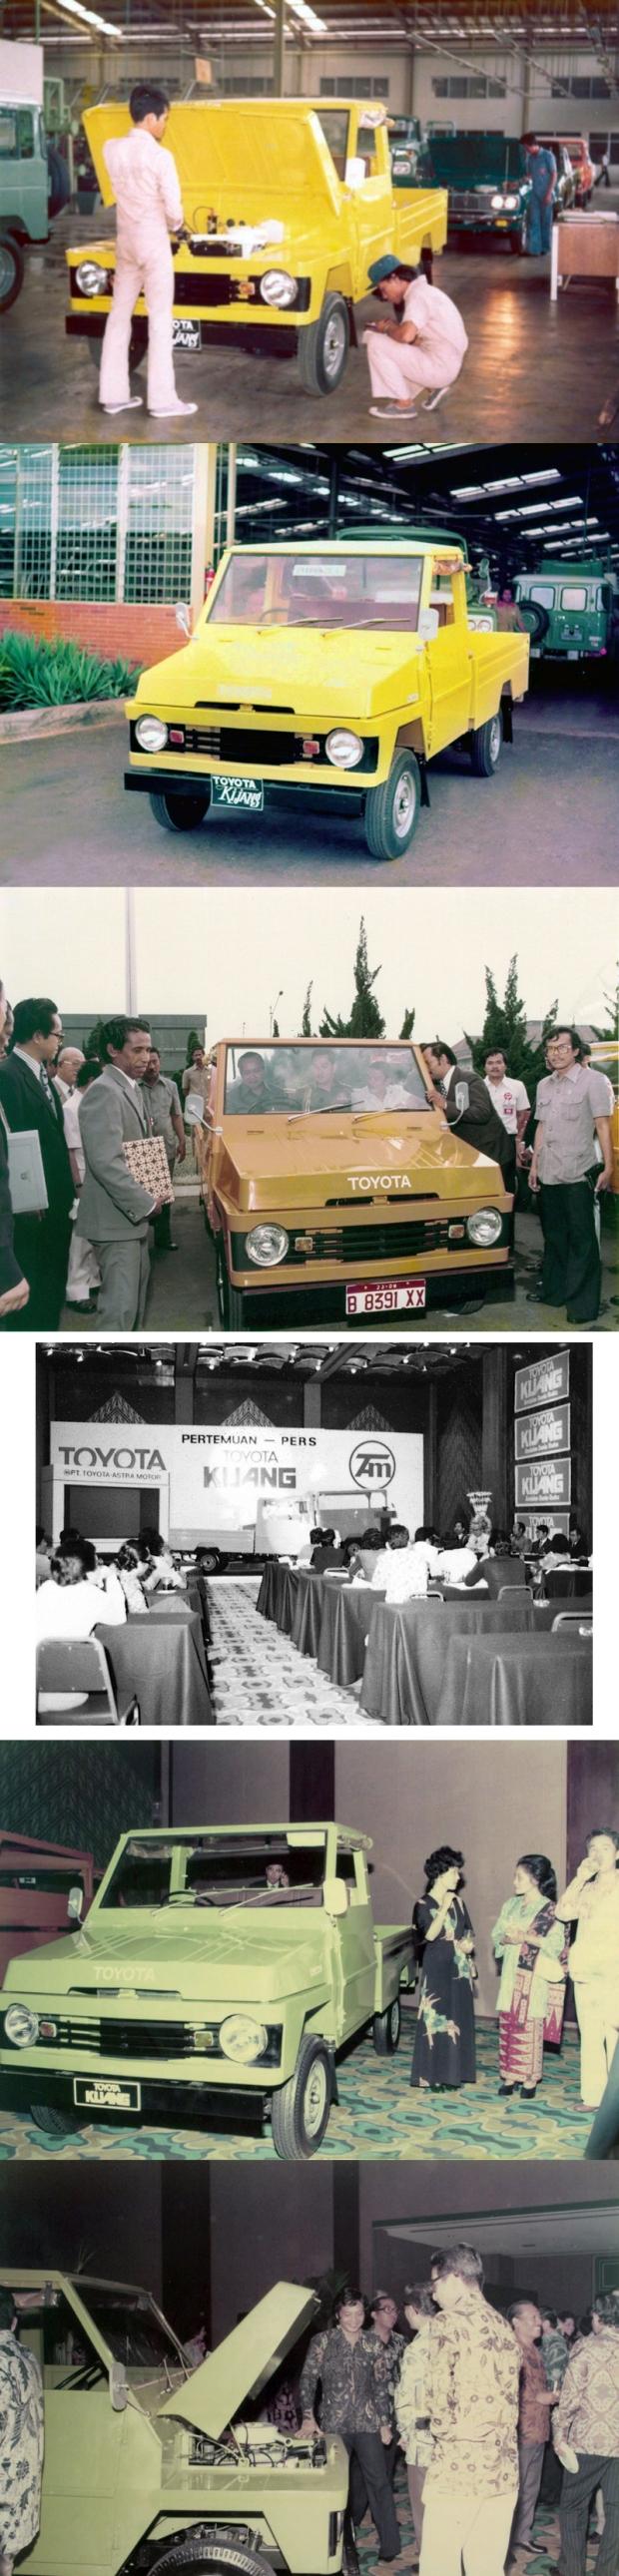 1977_toyota_kijang_launching_ceremony